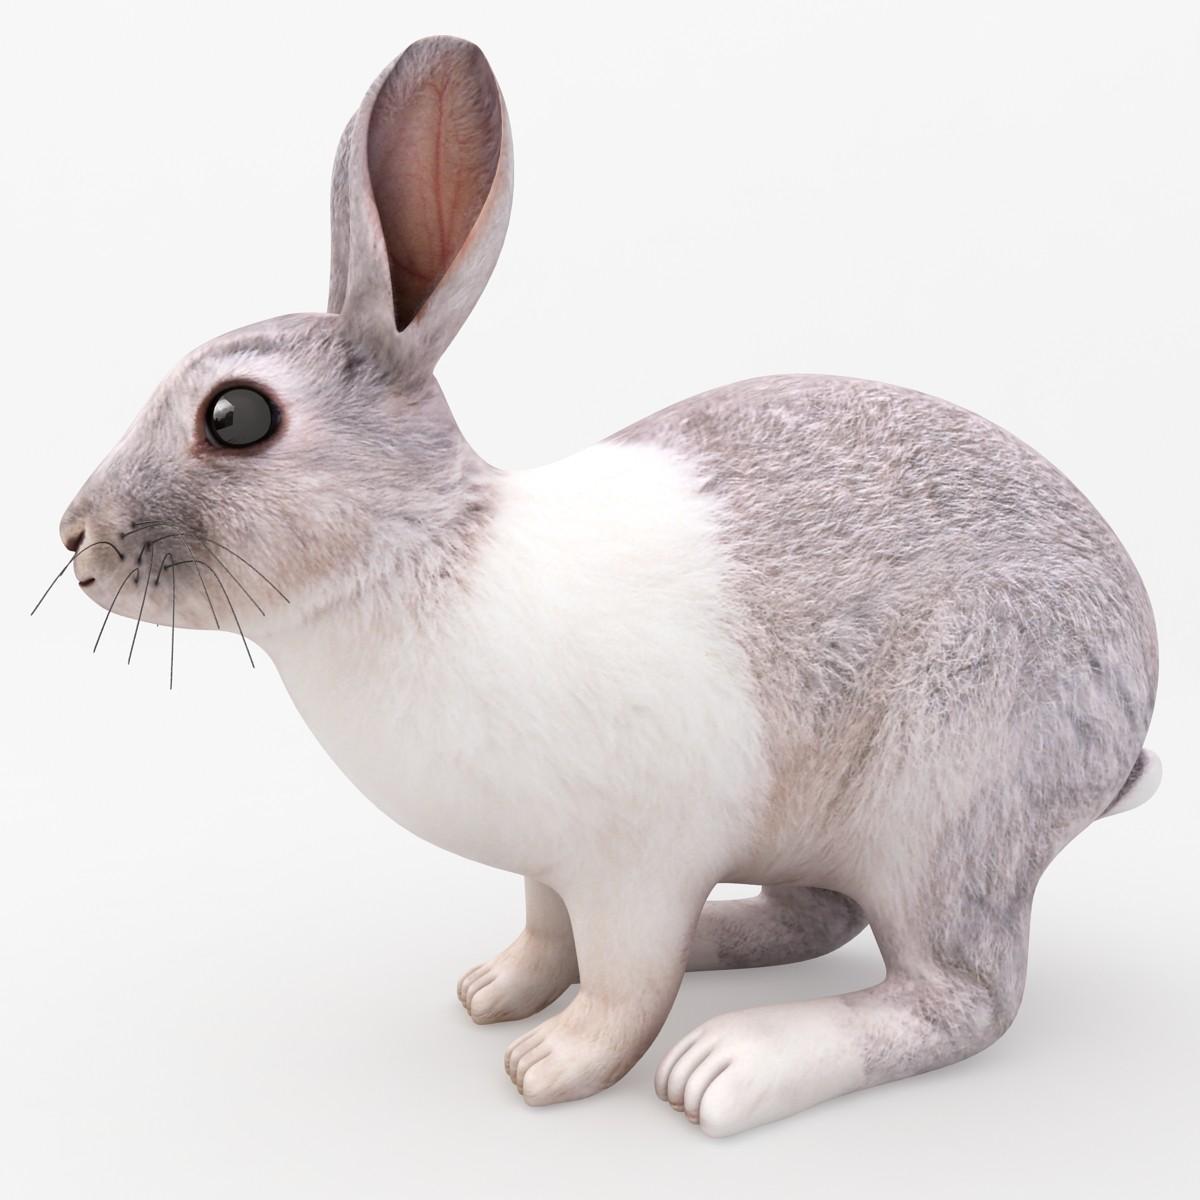 Rabbit_Rr_01.jpg